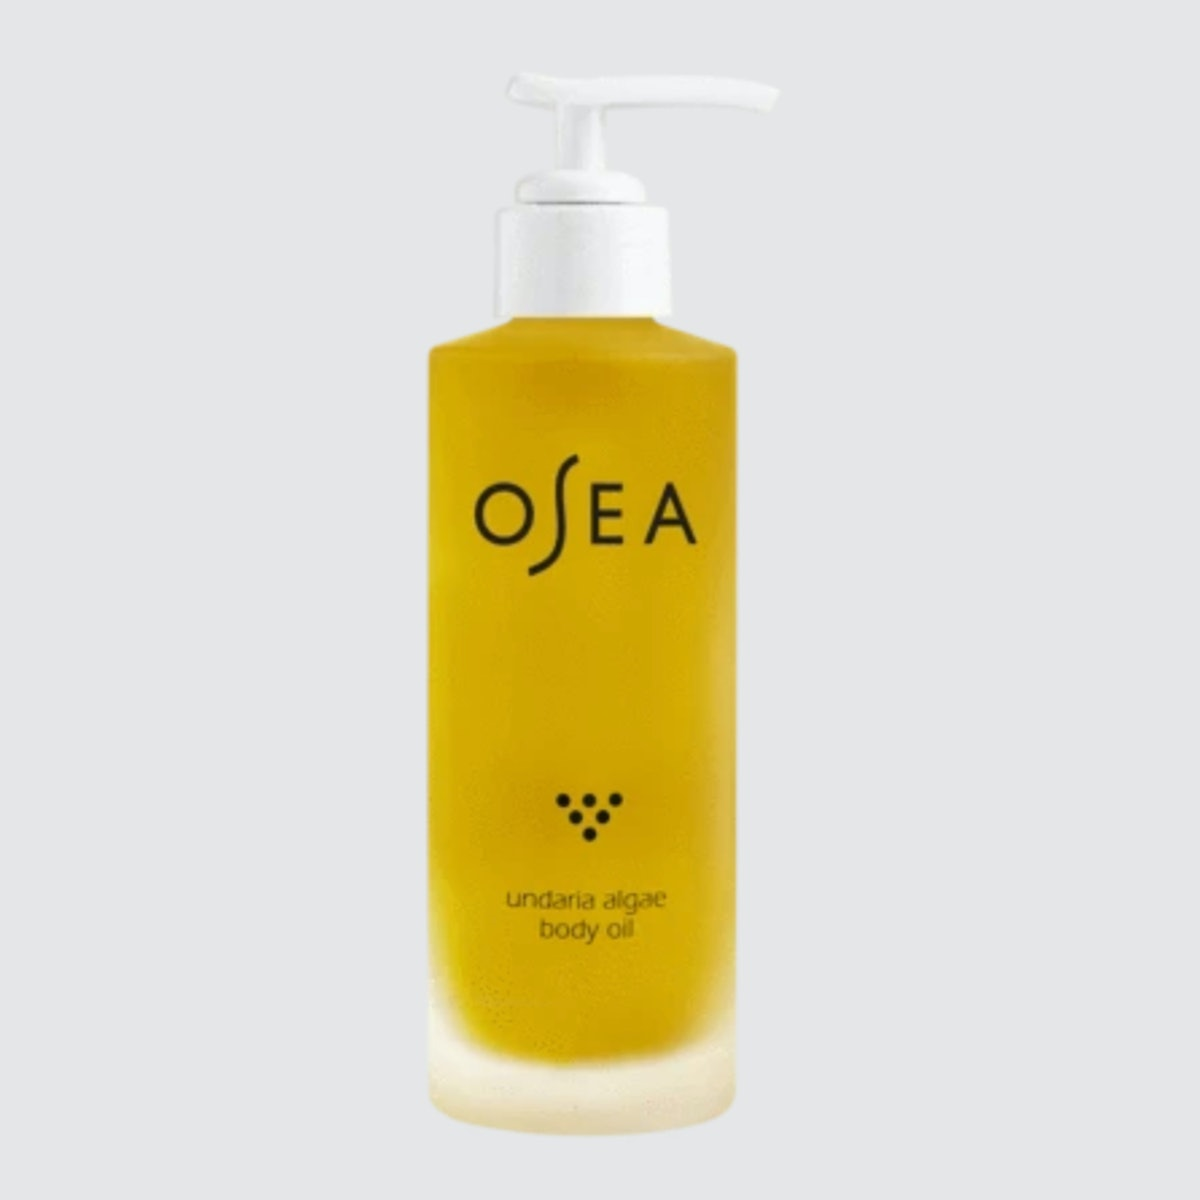 Osea Malibu Undaria Algae Body Oil